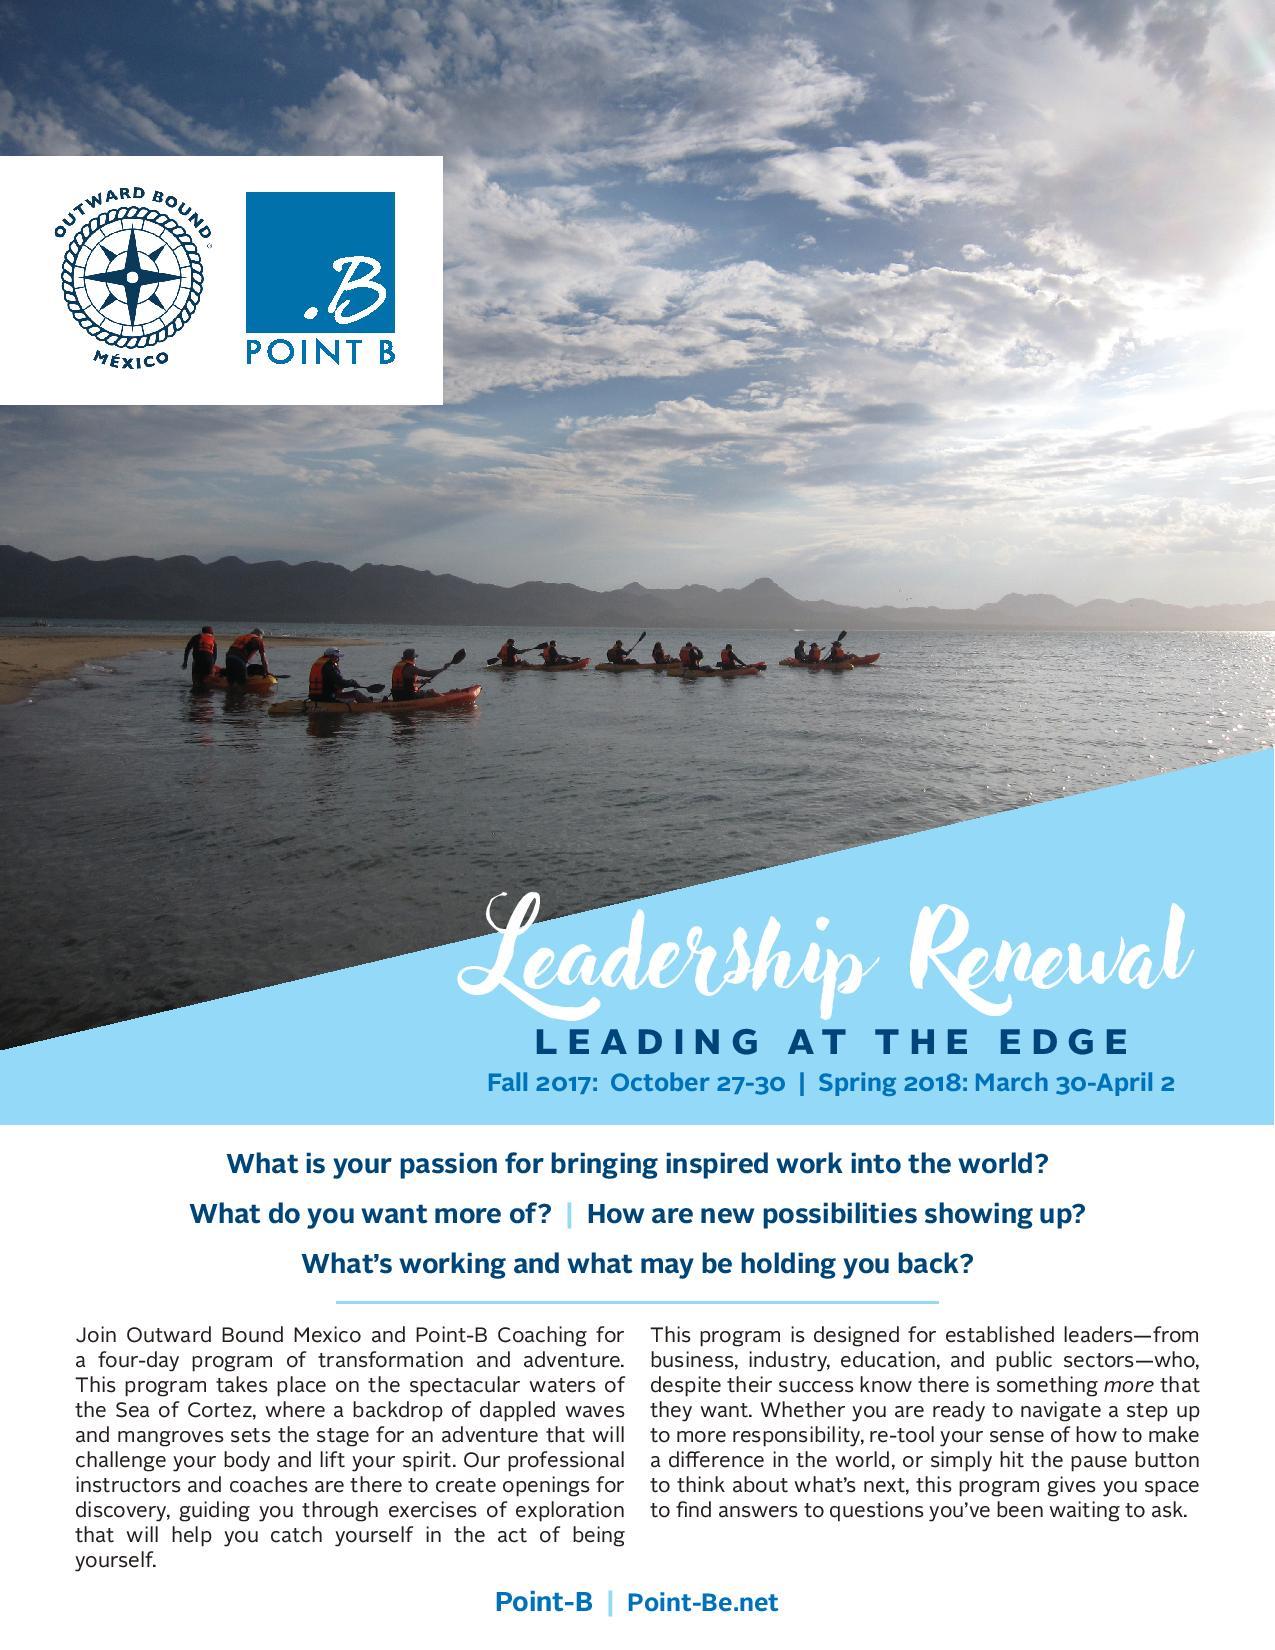 Leadership Renewal Flyer-OBMexico Isla Tiburon REVISED 8-24-17-page-001.jpg